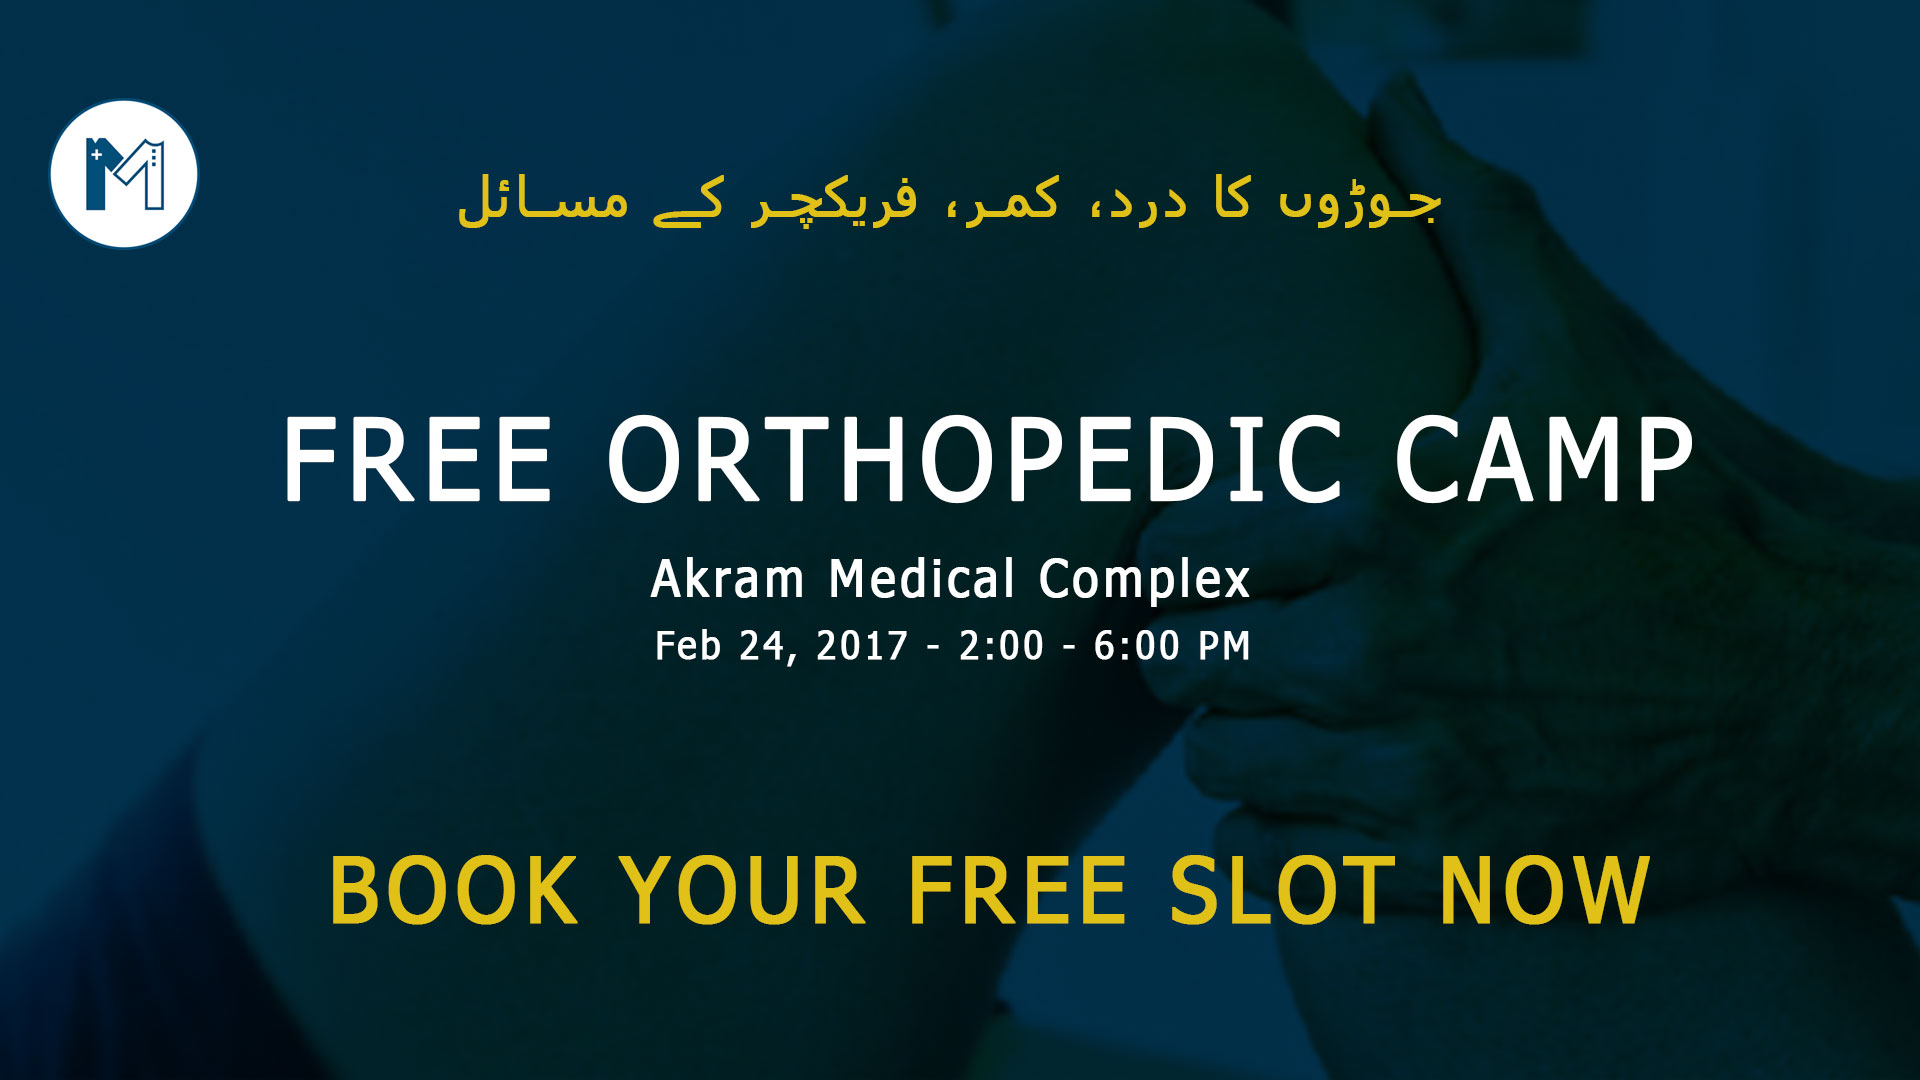 Free Orthopedic Camp